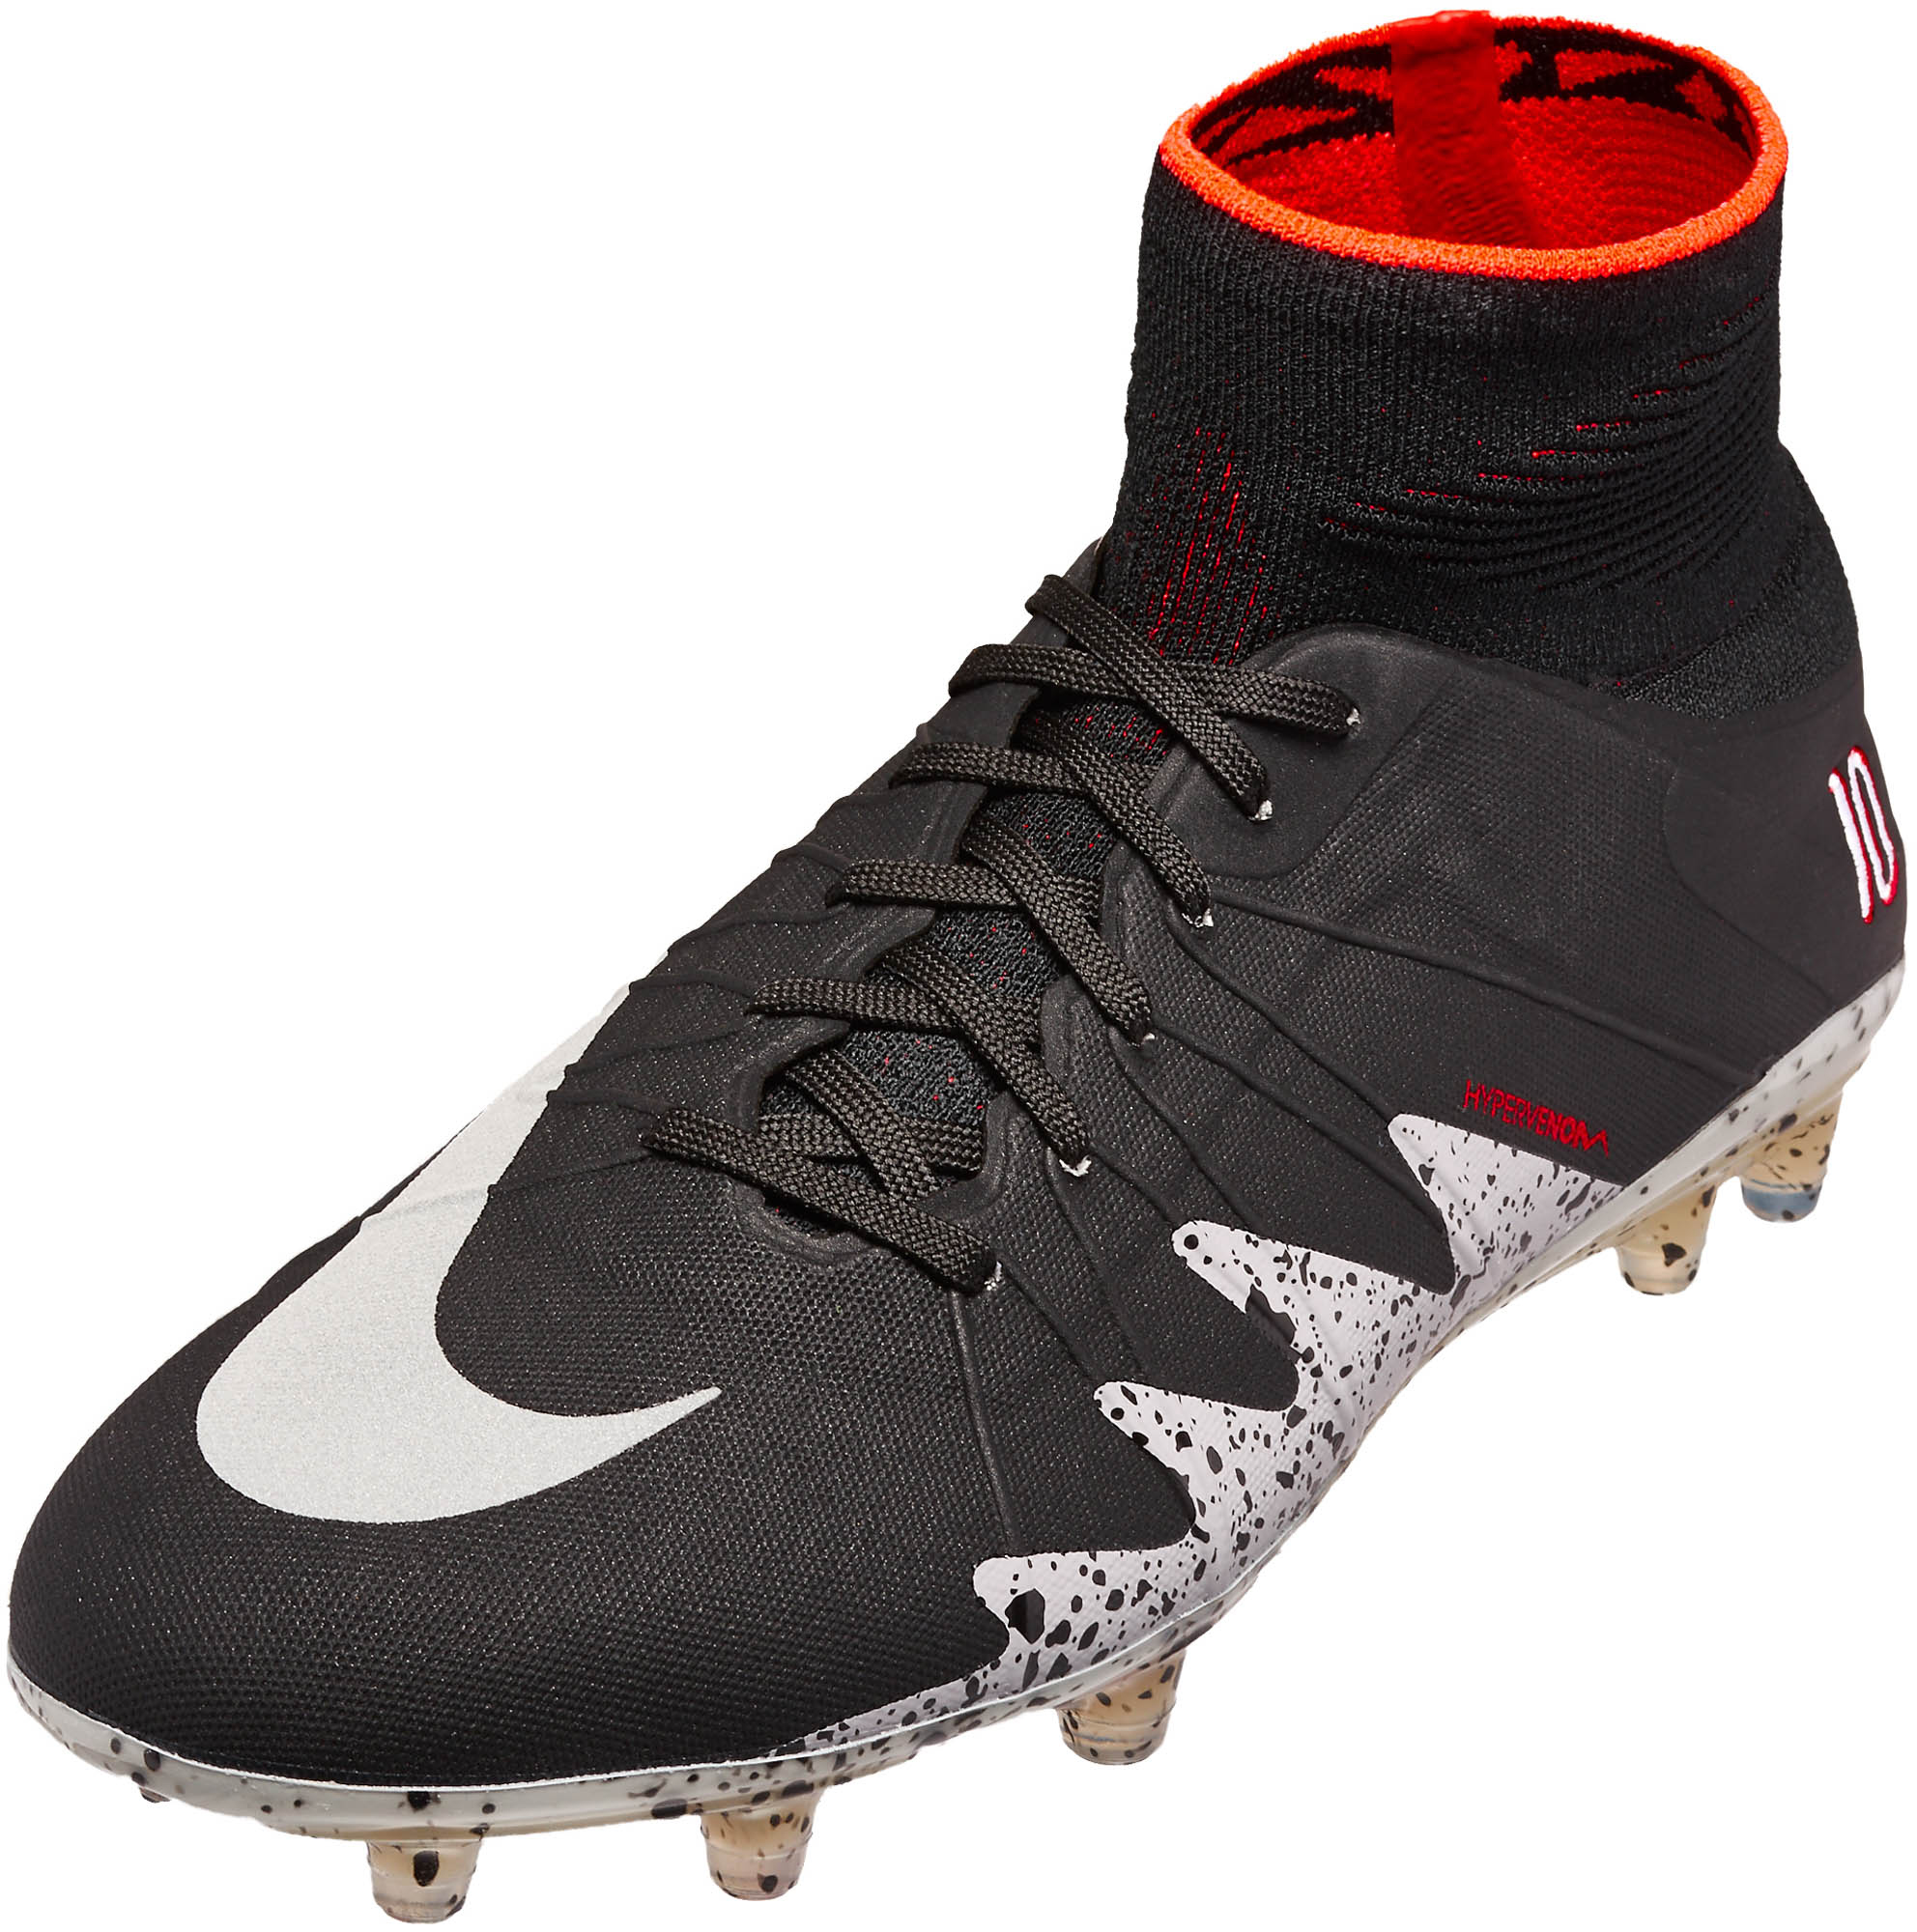 df44ead6db6f michael jordan soccer cleats on sale > OFF55% Discounts